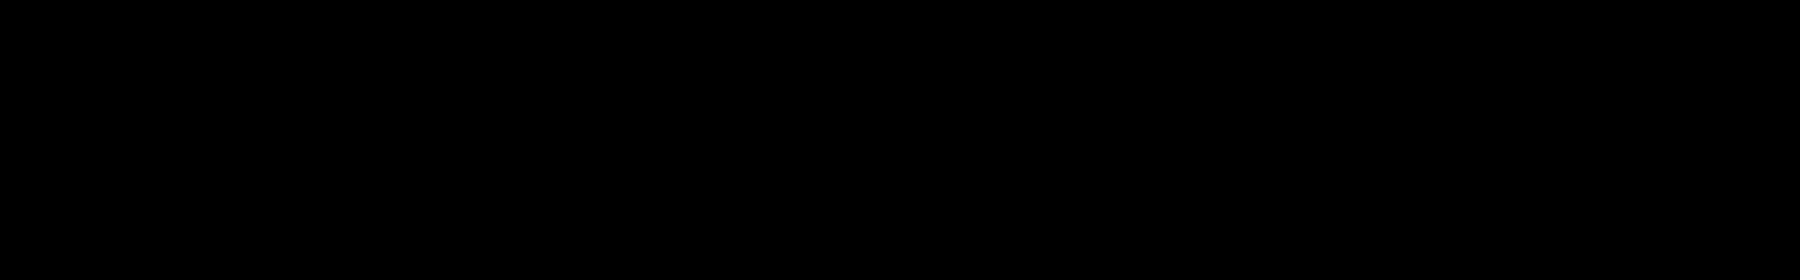 SINEE - MELODIC ELEMENTS audio waveform